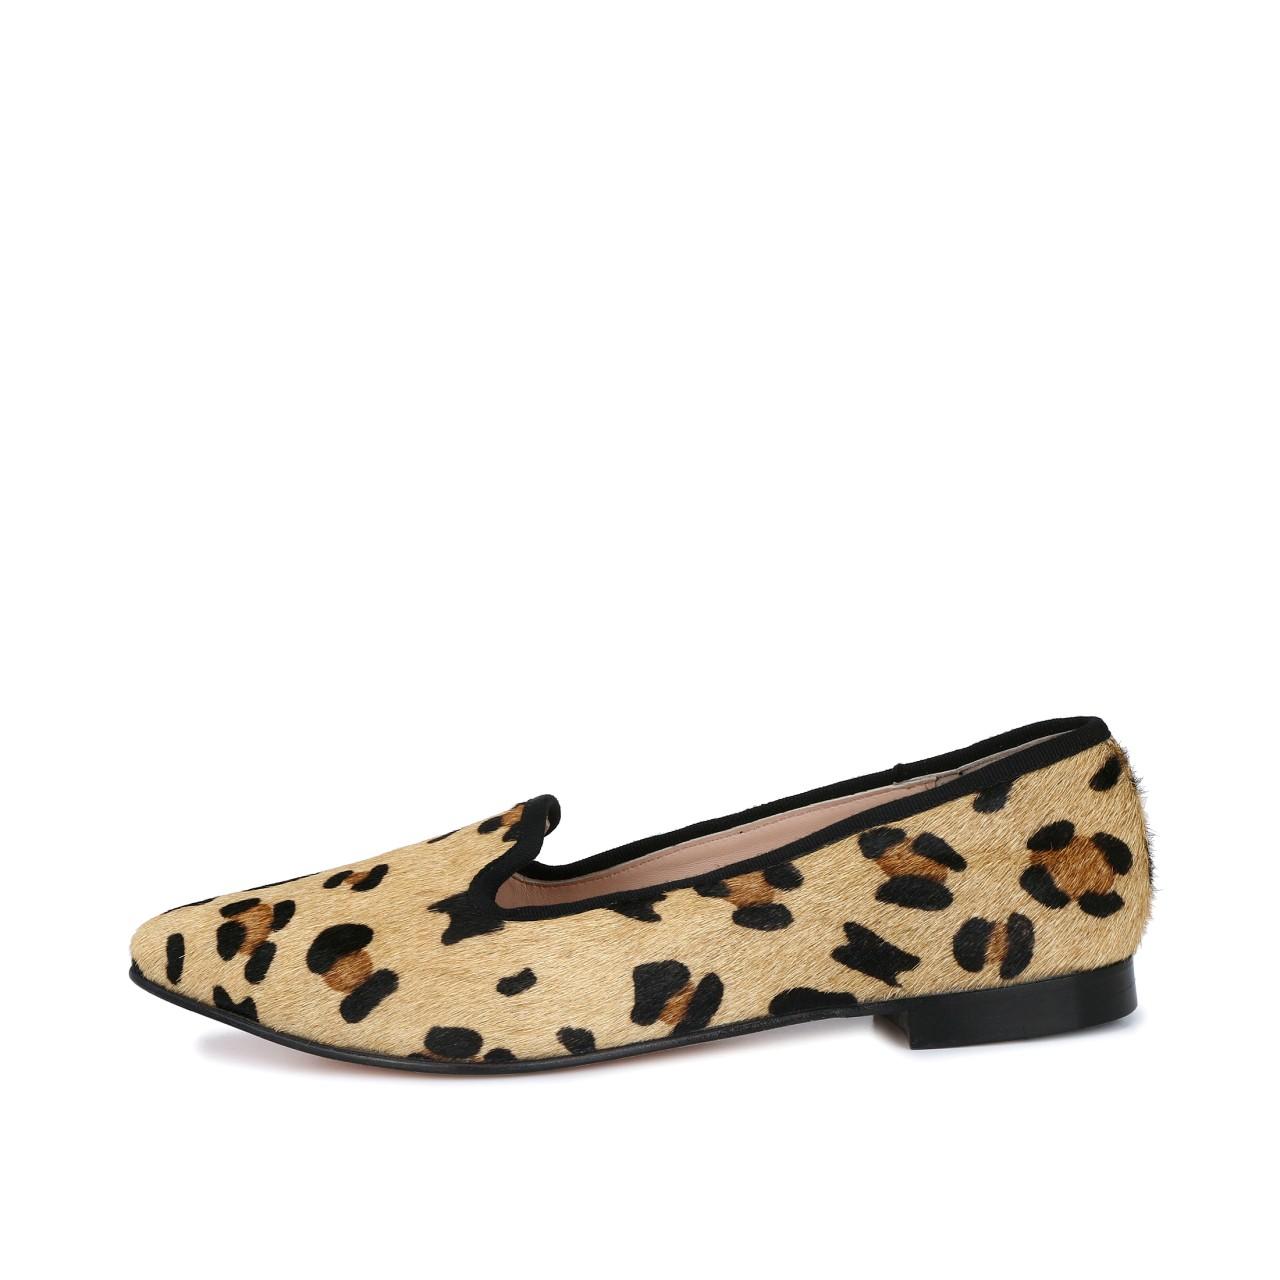 PARIS Fell Leopard